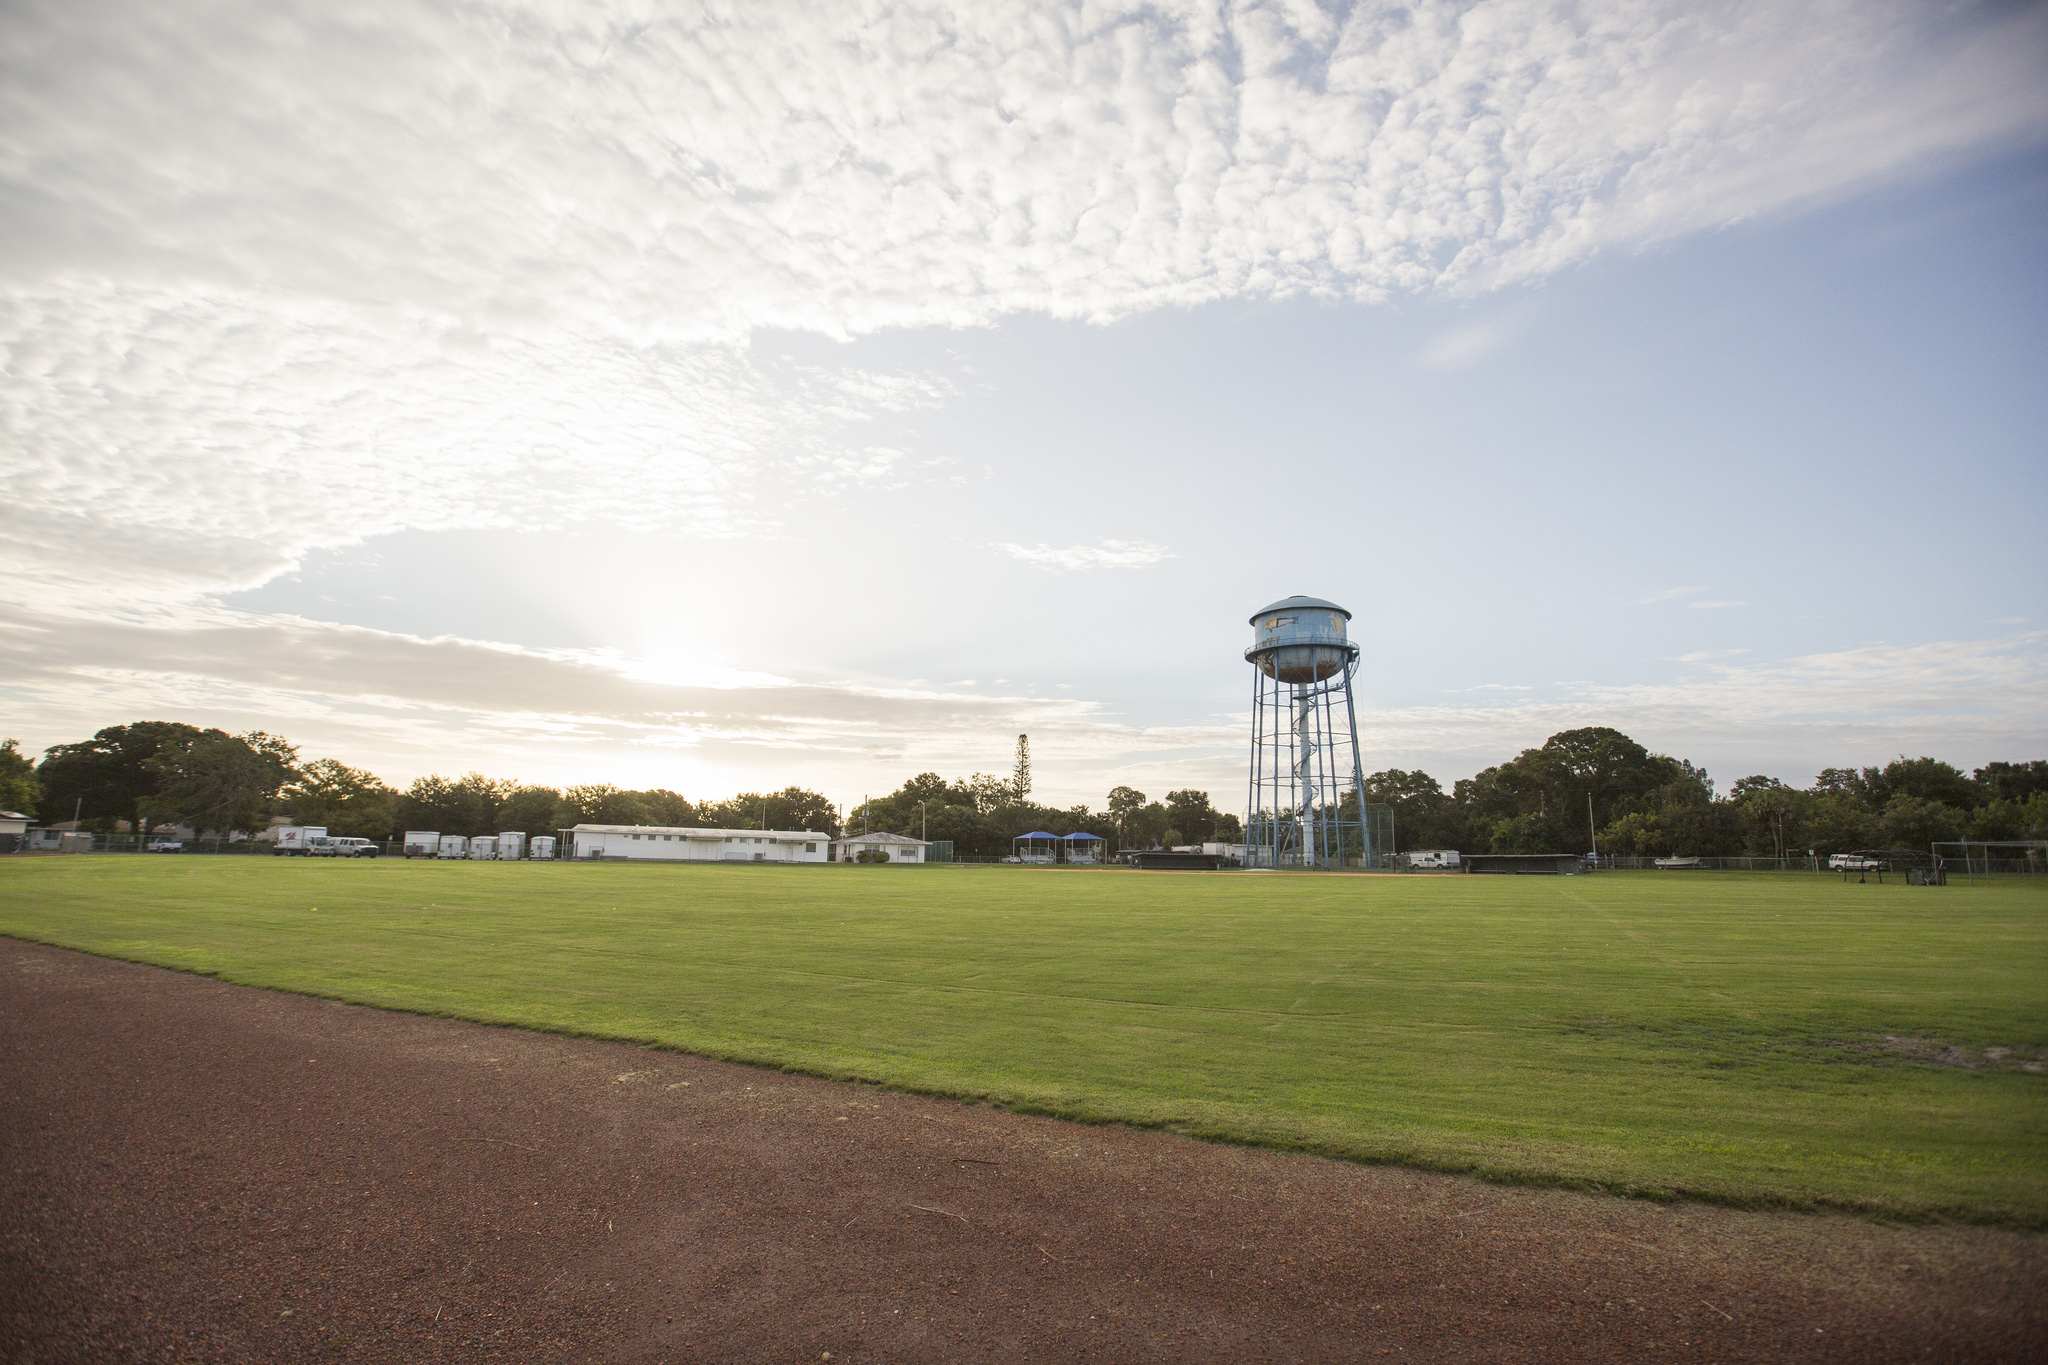 Huggins-Stengel Field at Crescent Lake Park